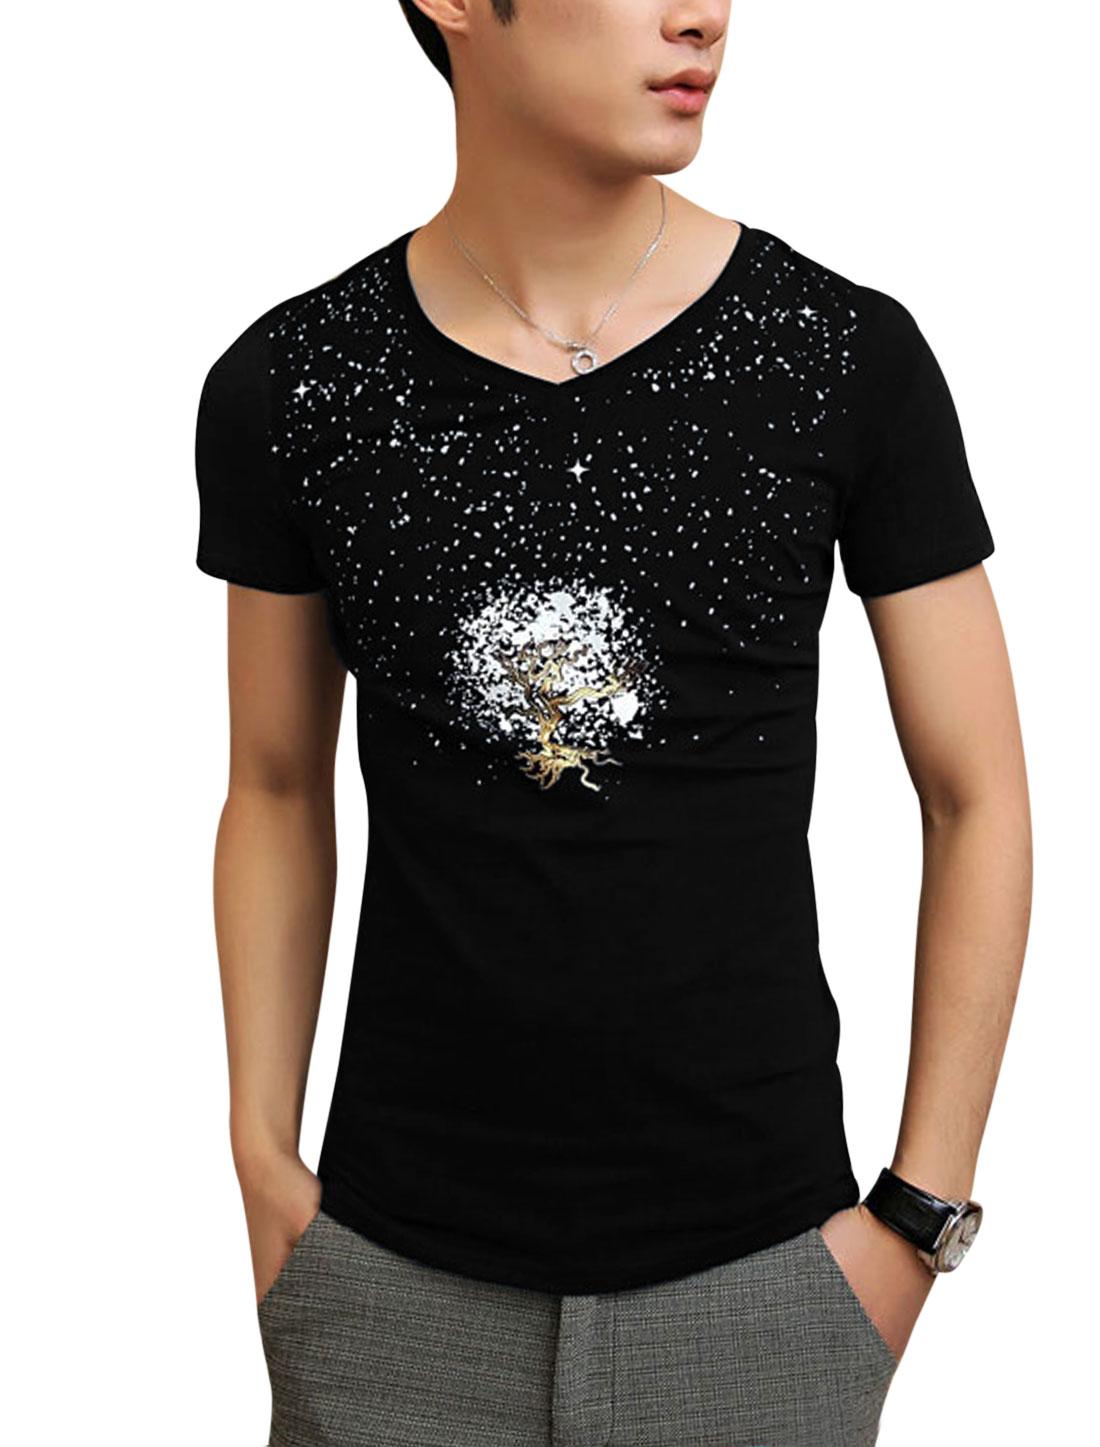 Men Stretchy V Neck Tree Dots Printed Summer Tee Shirt Black S